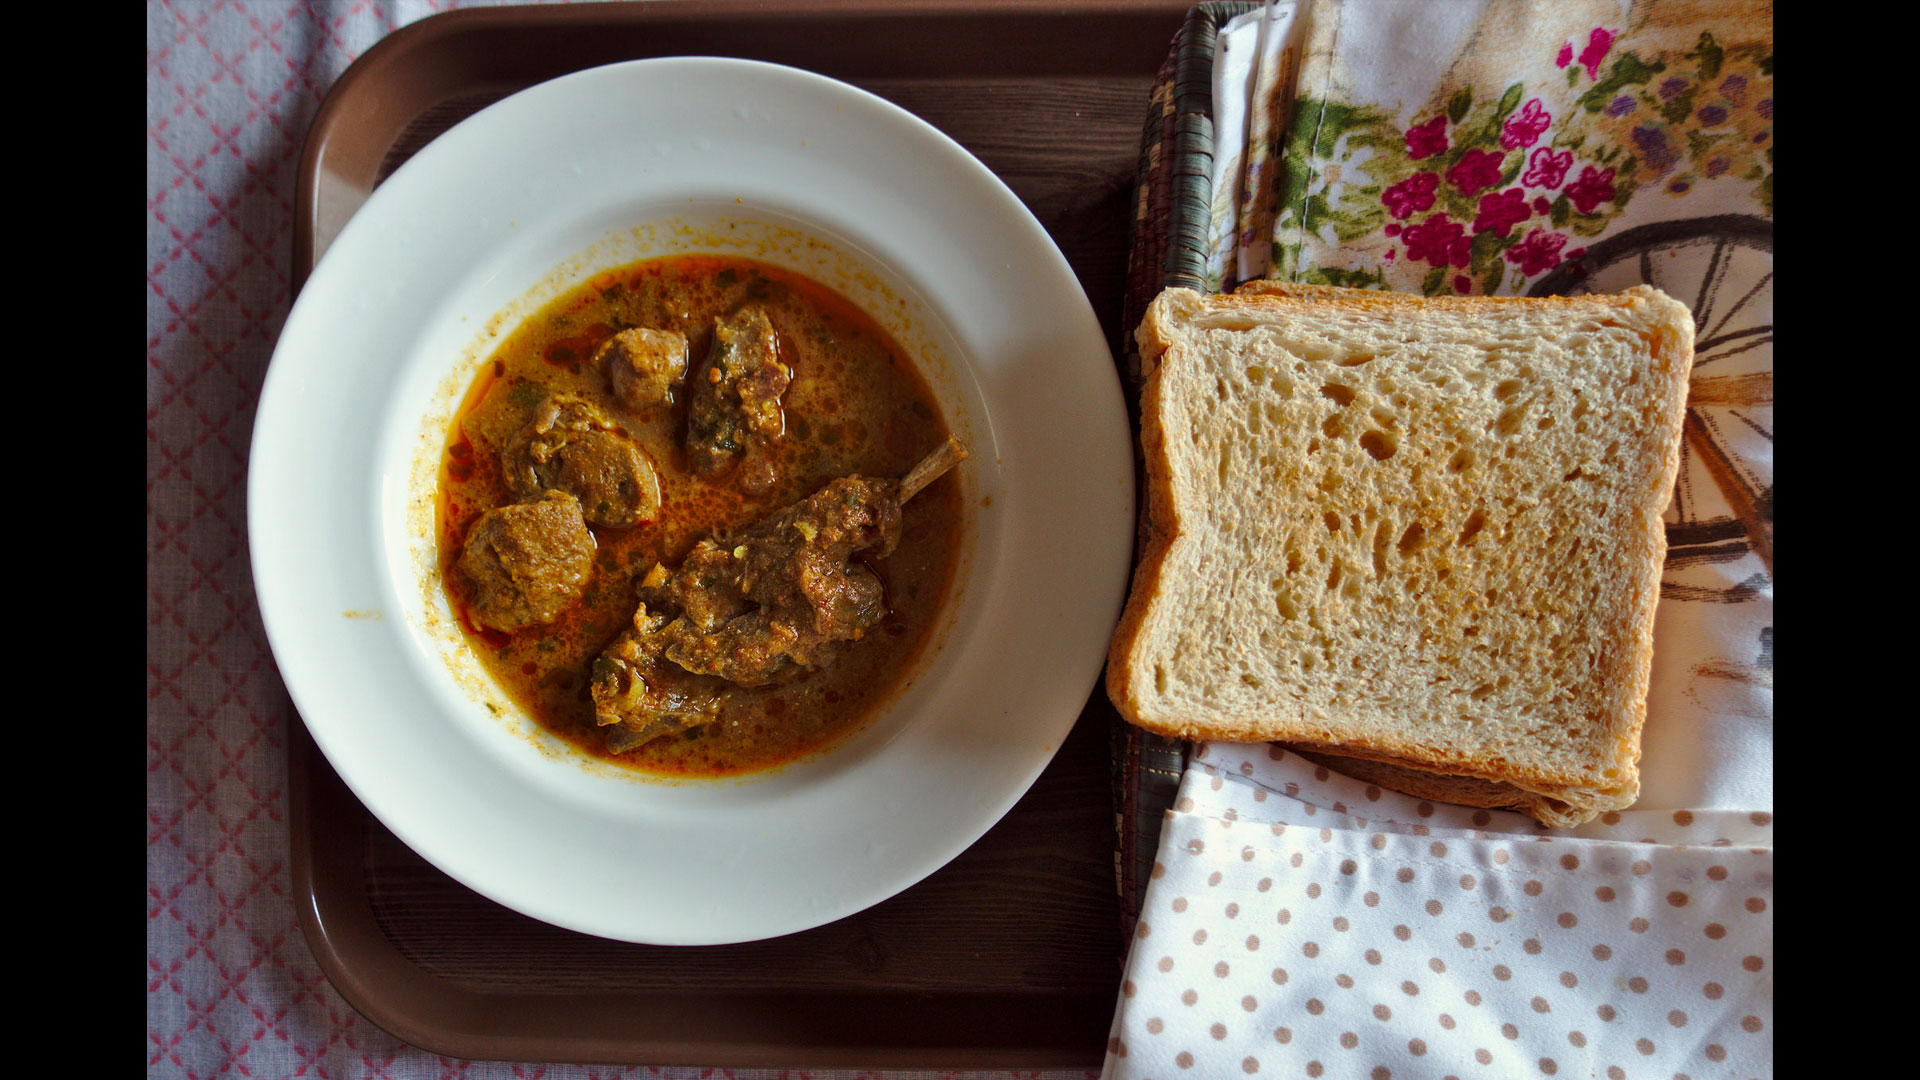 Food | Photographer: Mazhar KhanCurator: Bryan Esler